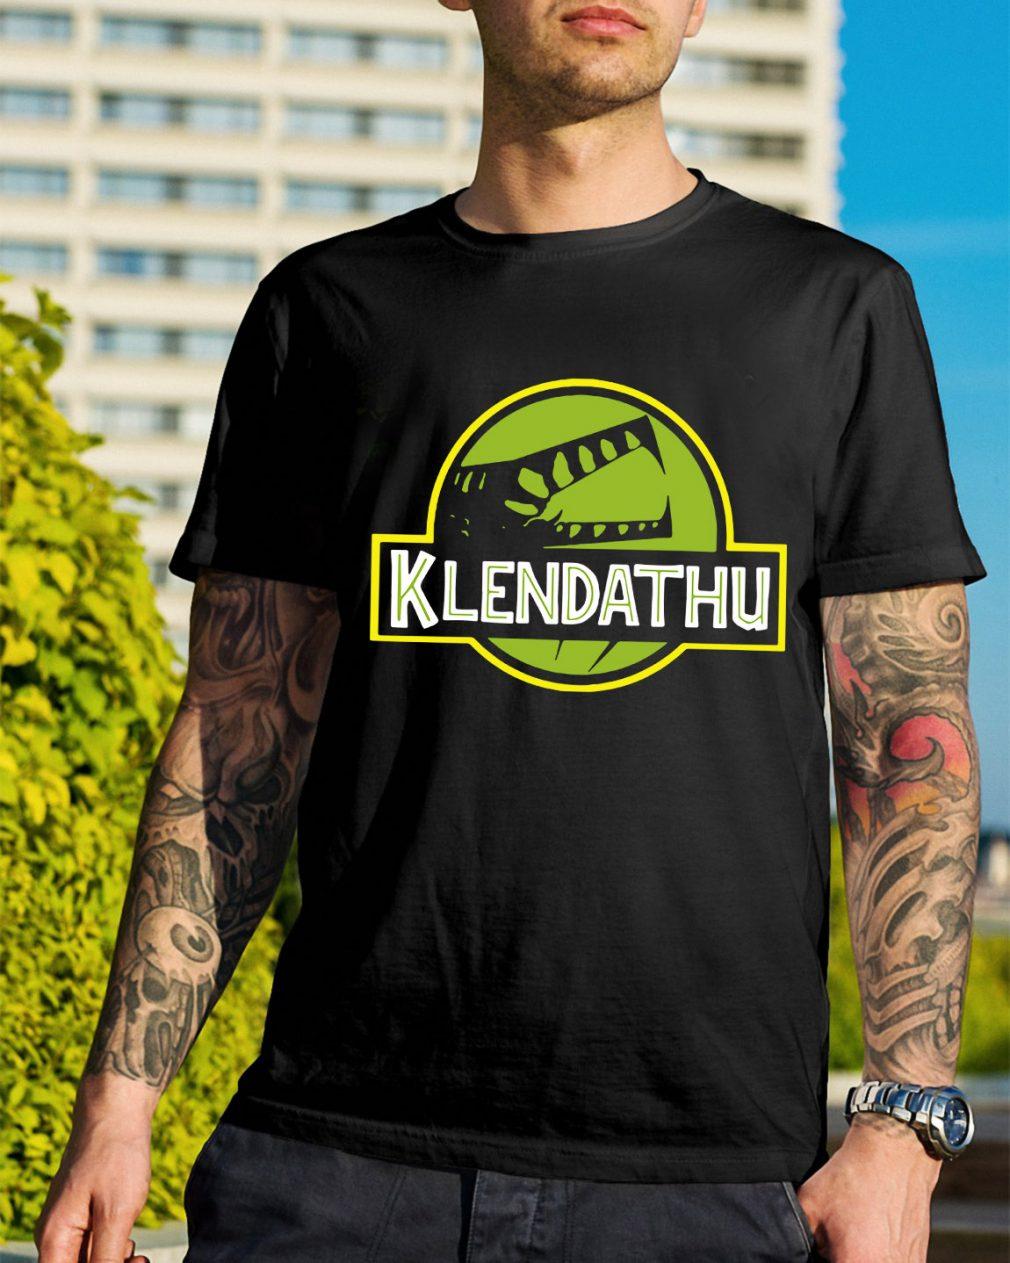 Starship Troopers Klendathu shirt